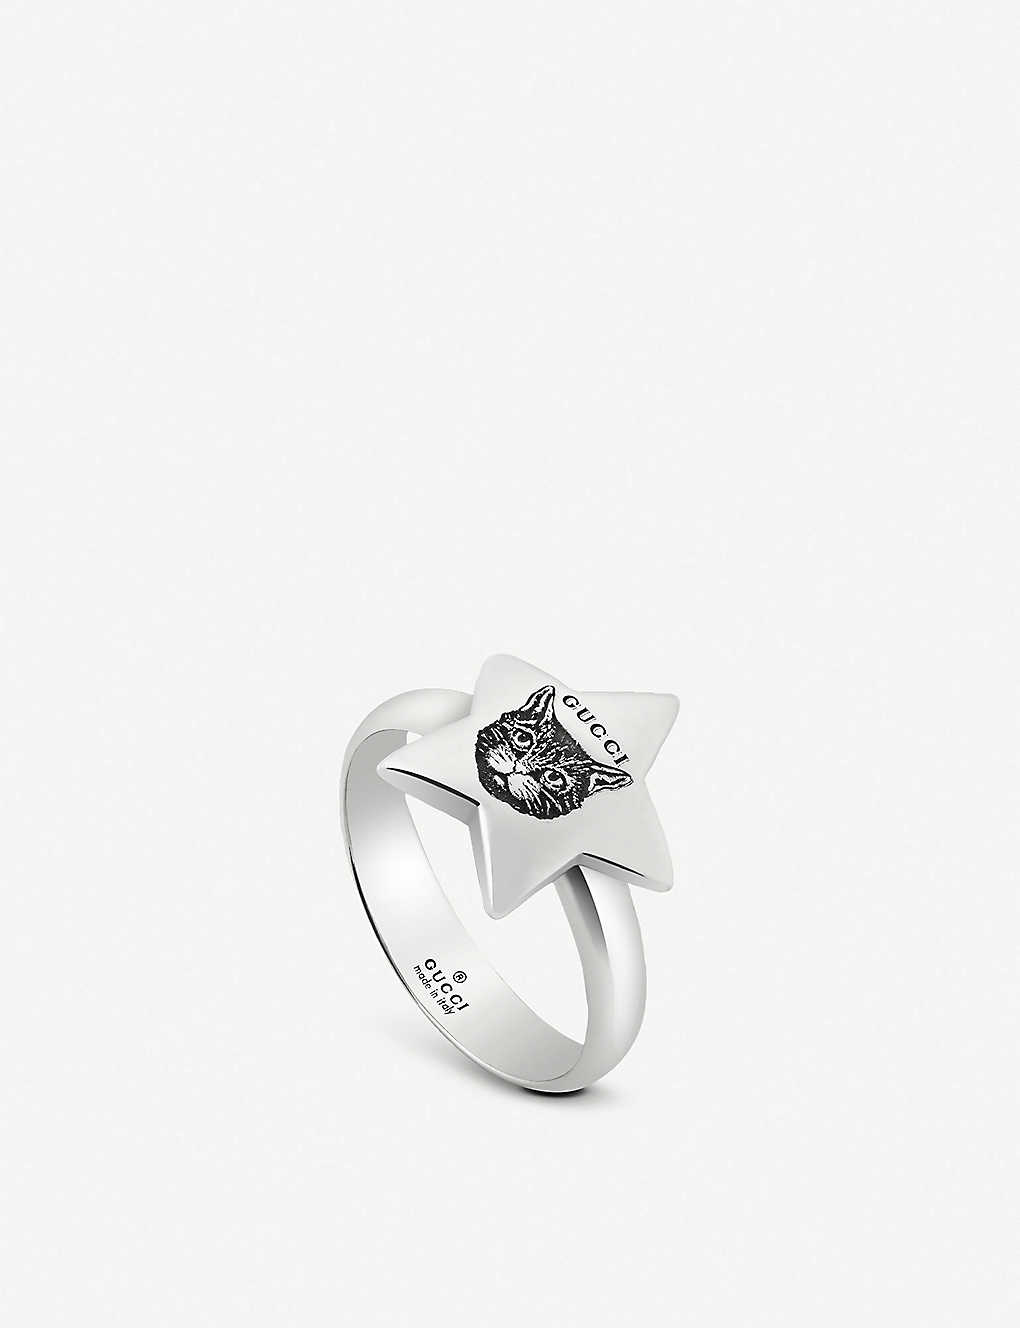 012c634eb GUCCI - Blind For Love star shape sterling silver ring | Selfridges.com